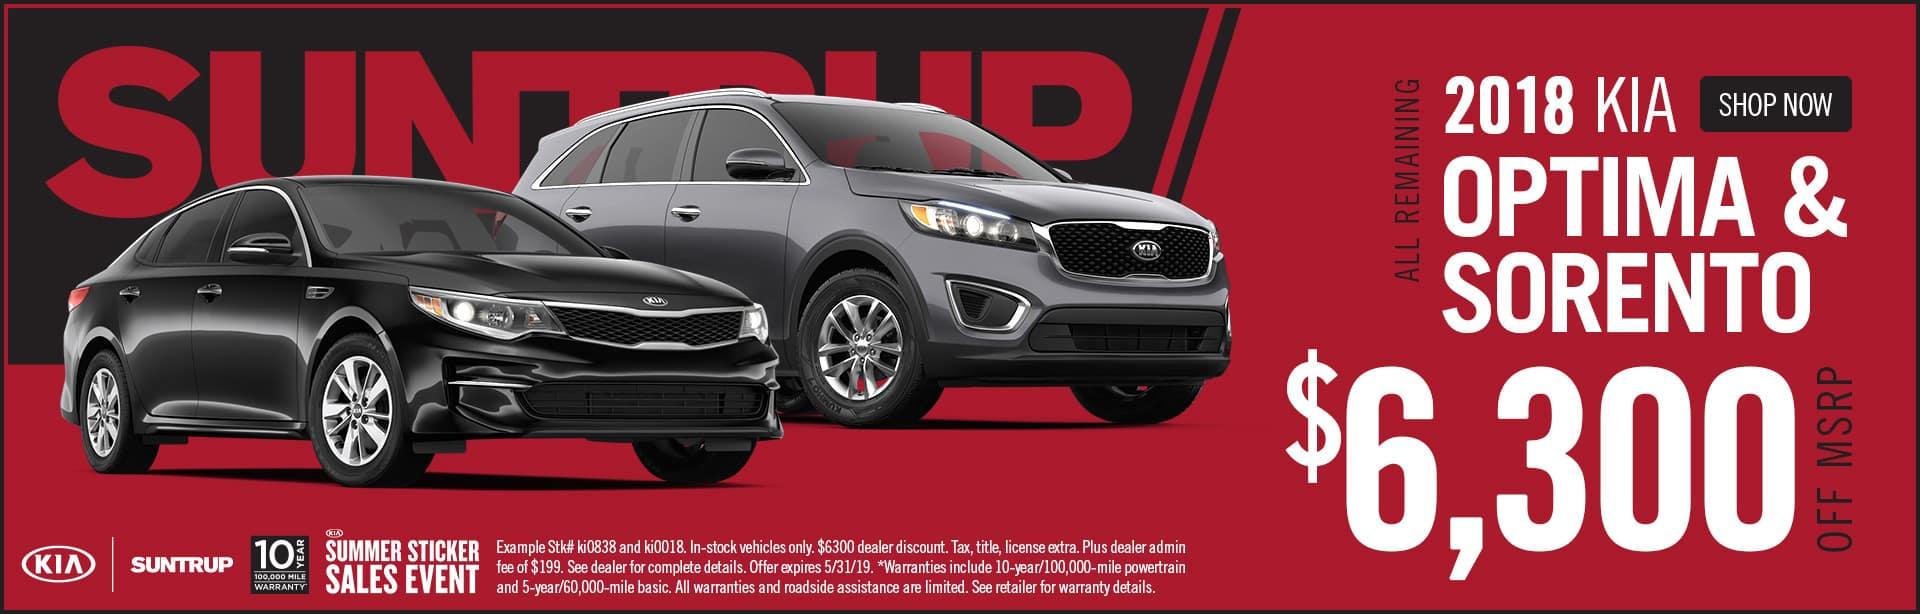 Suntrup Kia South >> Suntrup Kia South | Kia Dealer in St. Louis, MO